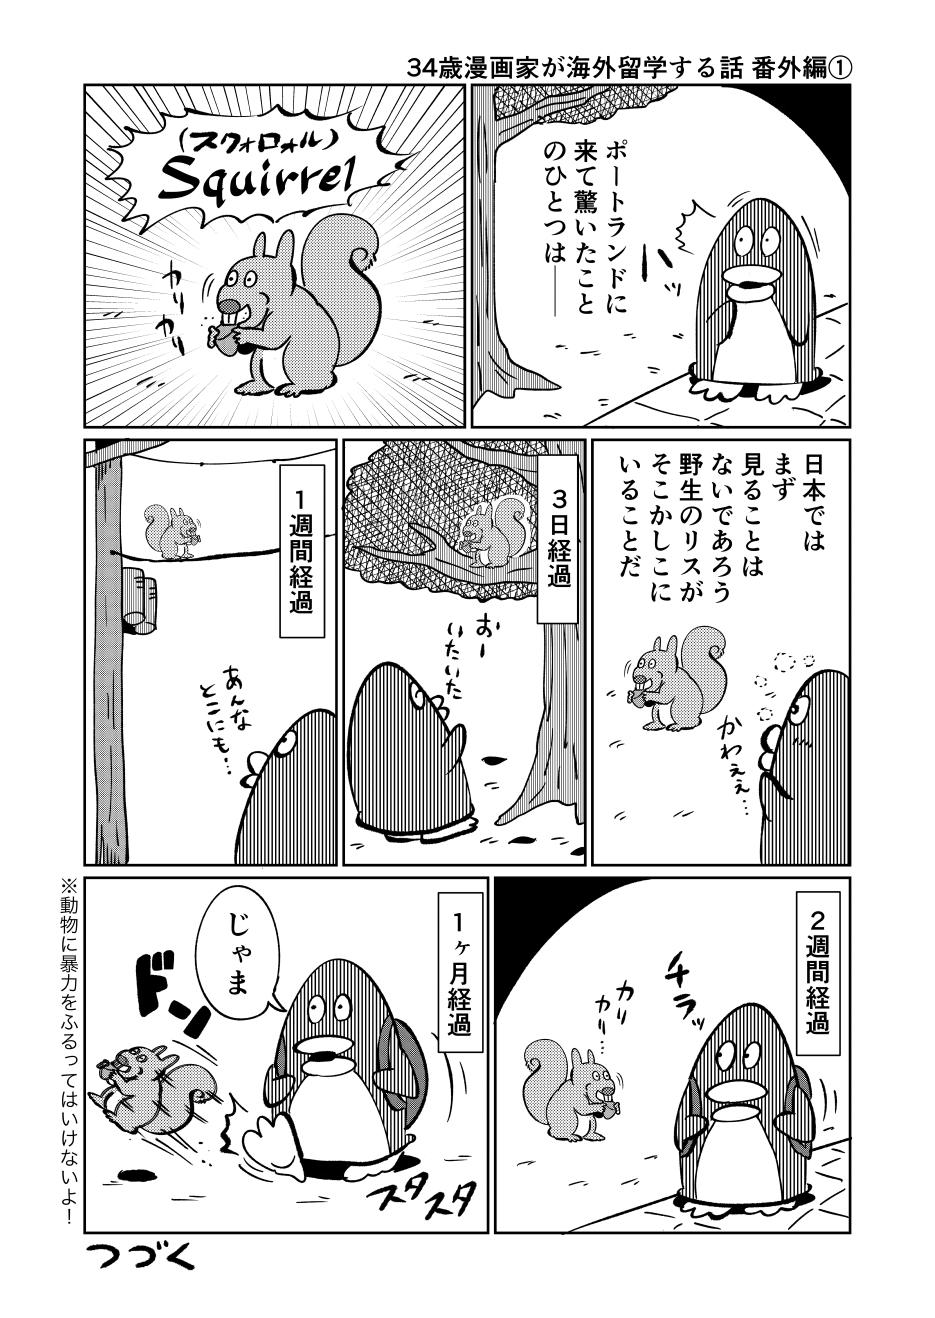 https://www.ryugaku.co.jp/blog/els_portland/upload/285ea003c6d0b5ba418496c5f6d05afabf6d73df.jpg